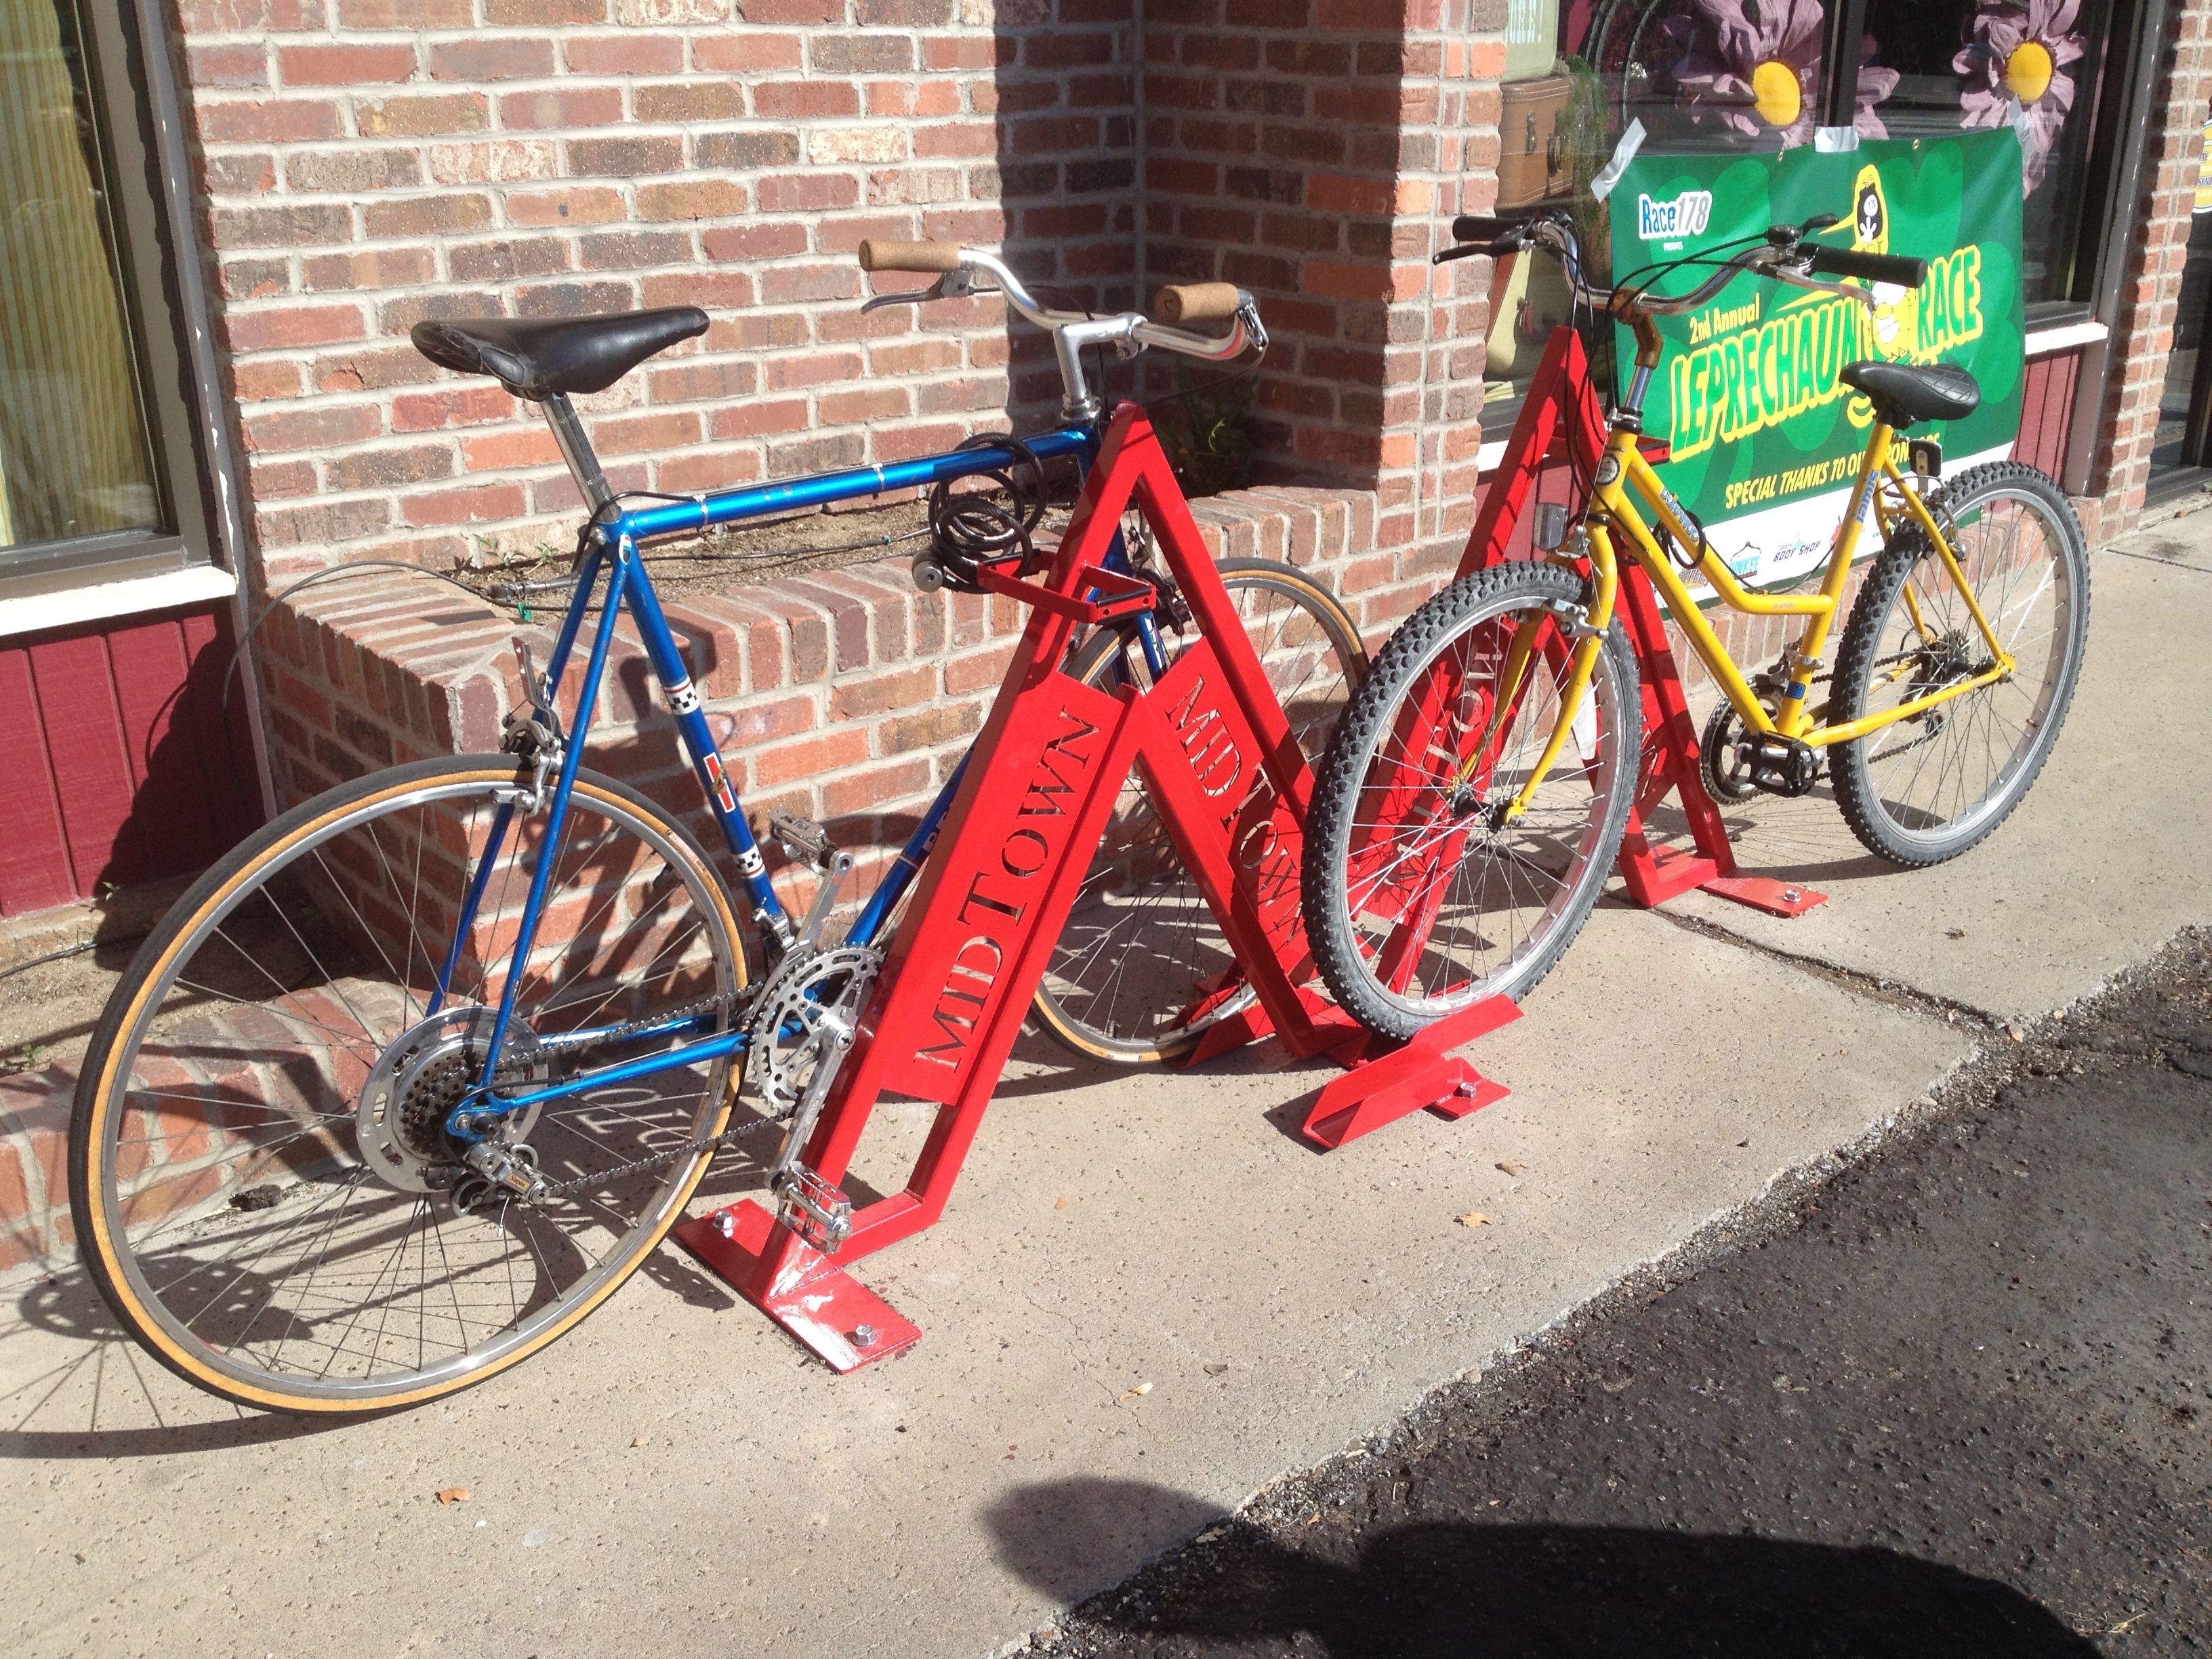 Custom red bike racks found in Midtown Reno, Nevada in front of ...